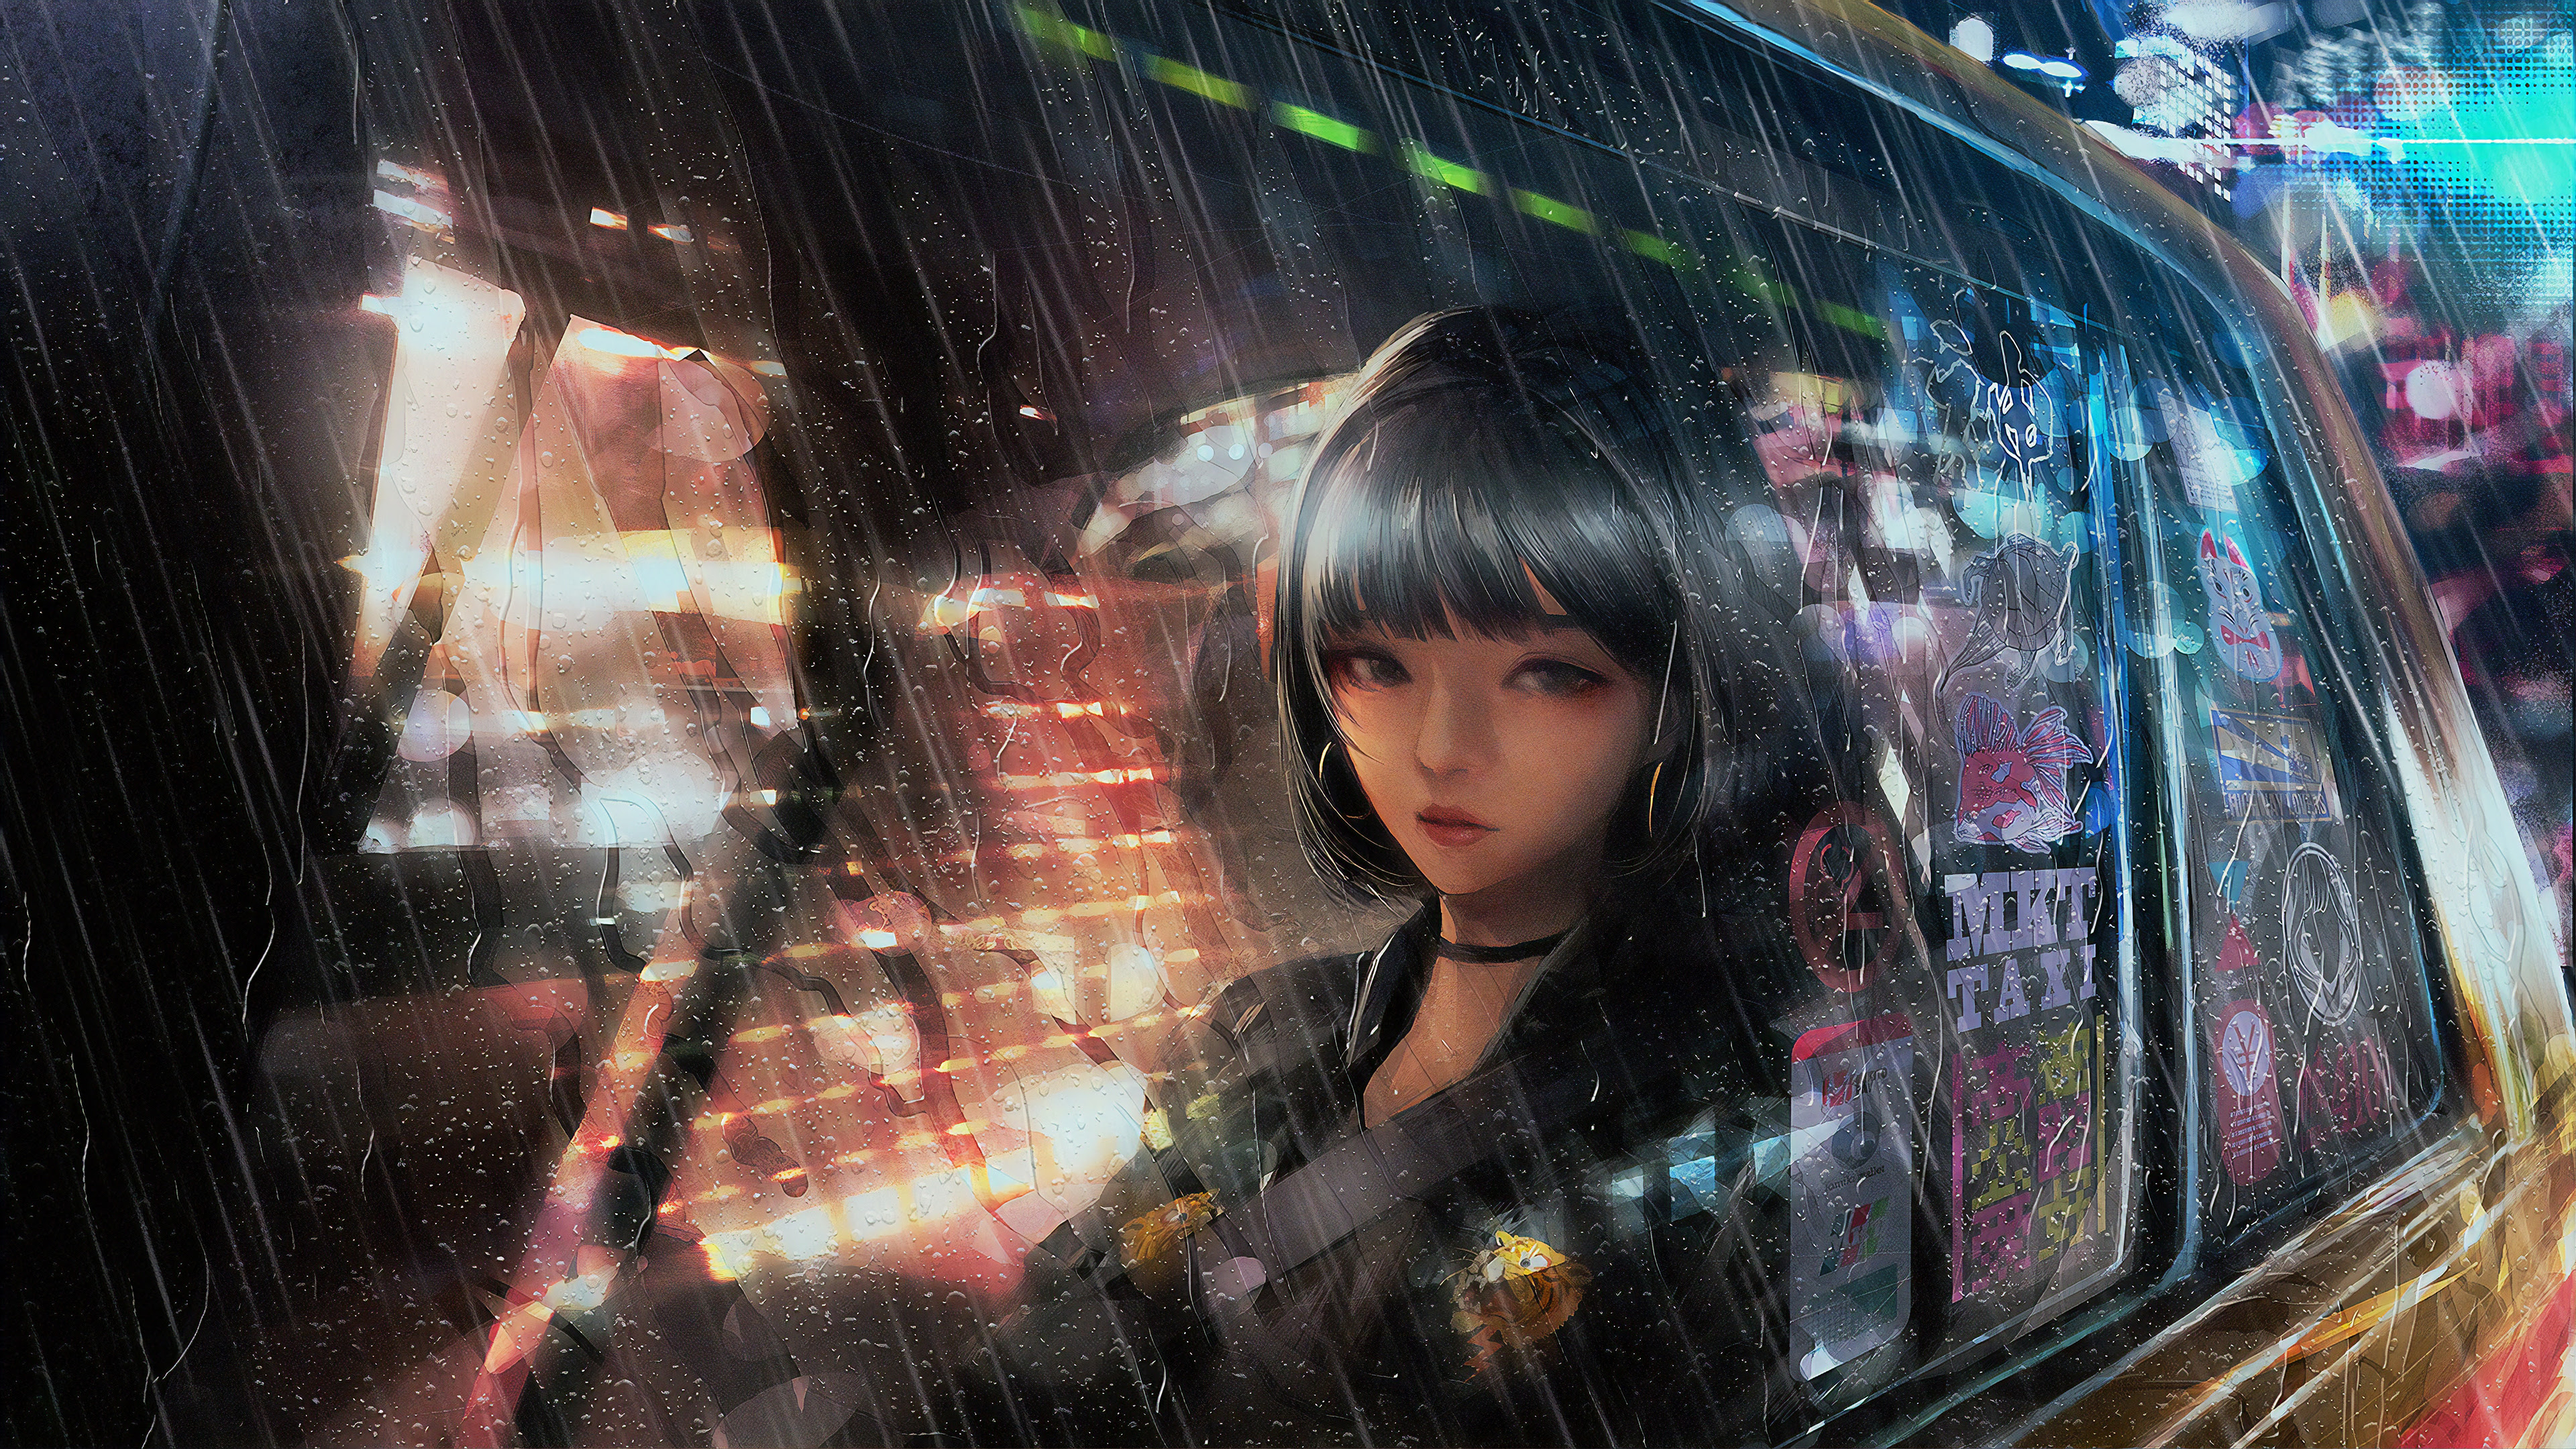 Anime Girl In Taxi Raining 4k, HD Anime, 4k Wallpapers ...